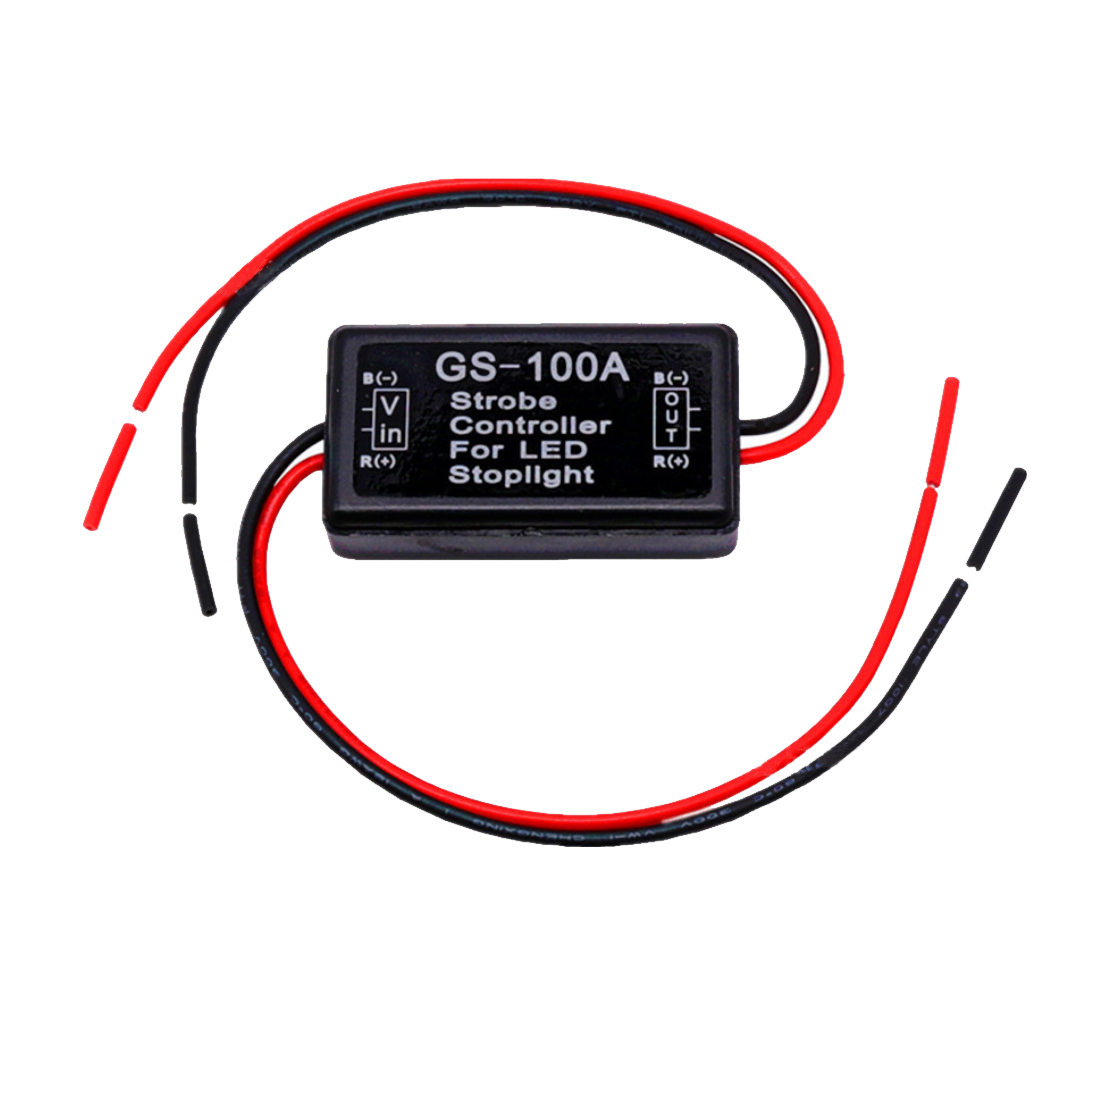 Tonewan GS-100A 12--24V Flash Strobe Controller Flasher for LED Flashing Back Rear Brake Stop Light Lamp Car Accessories